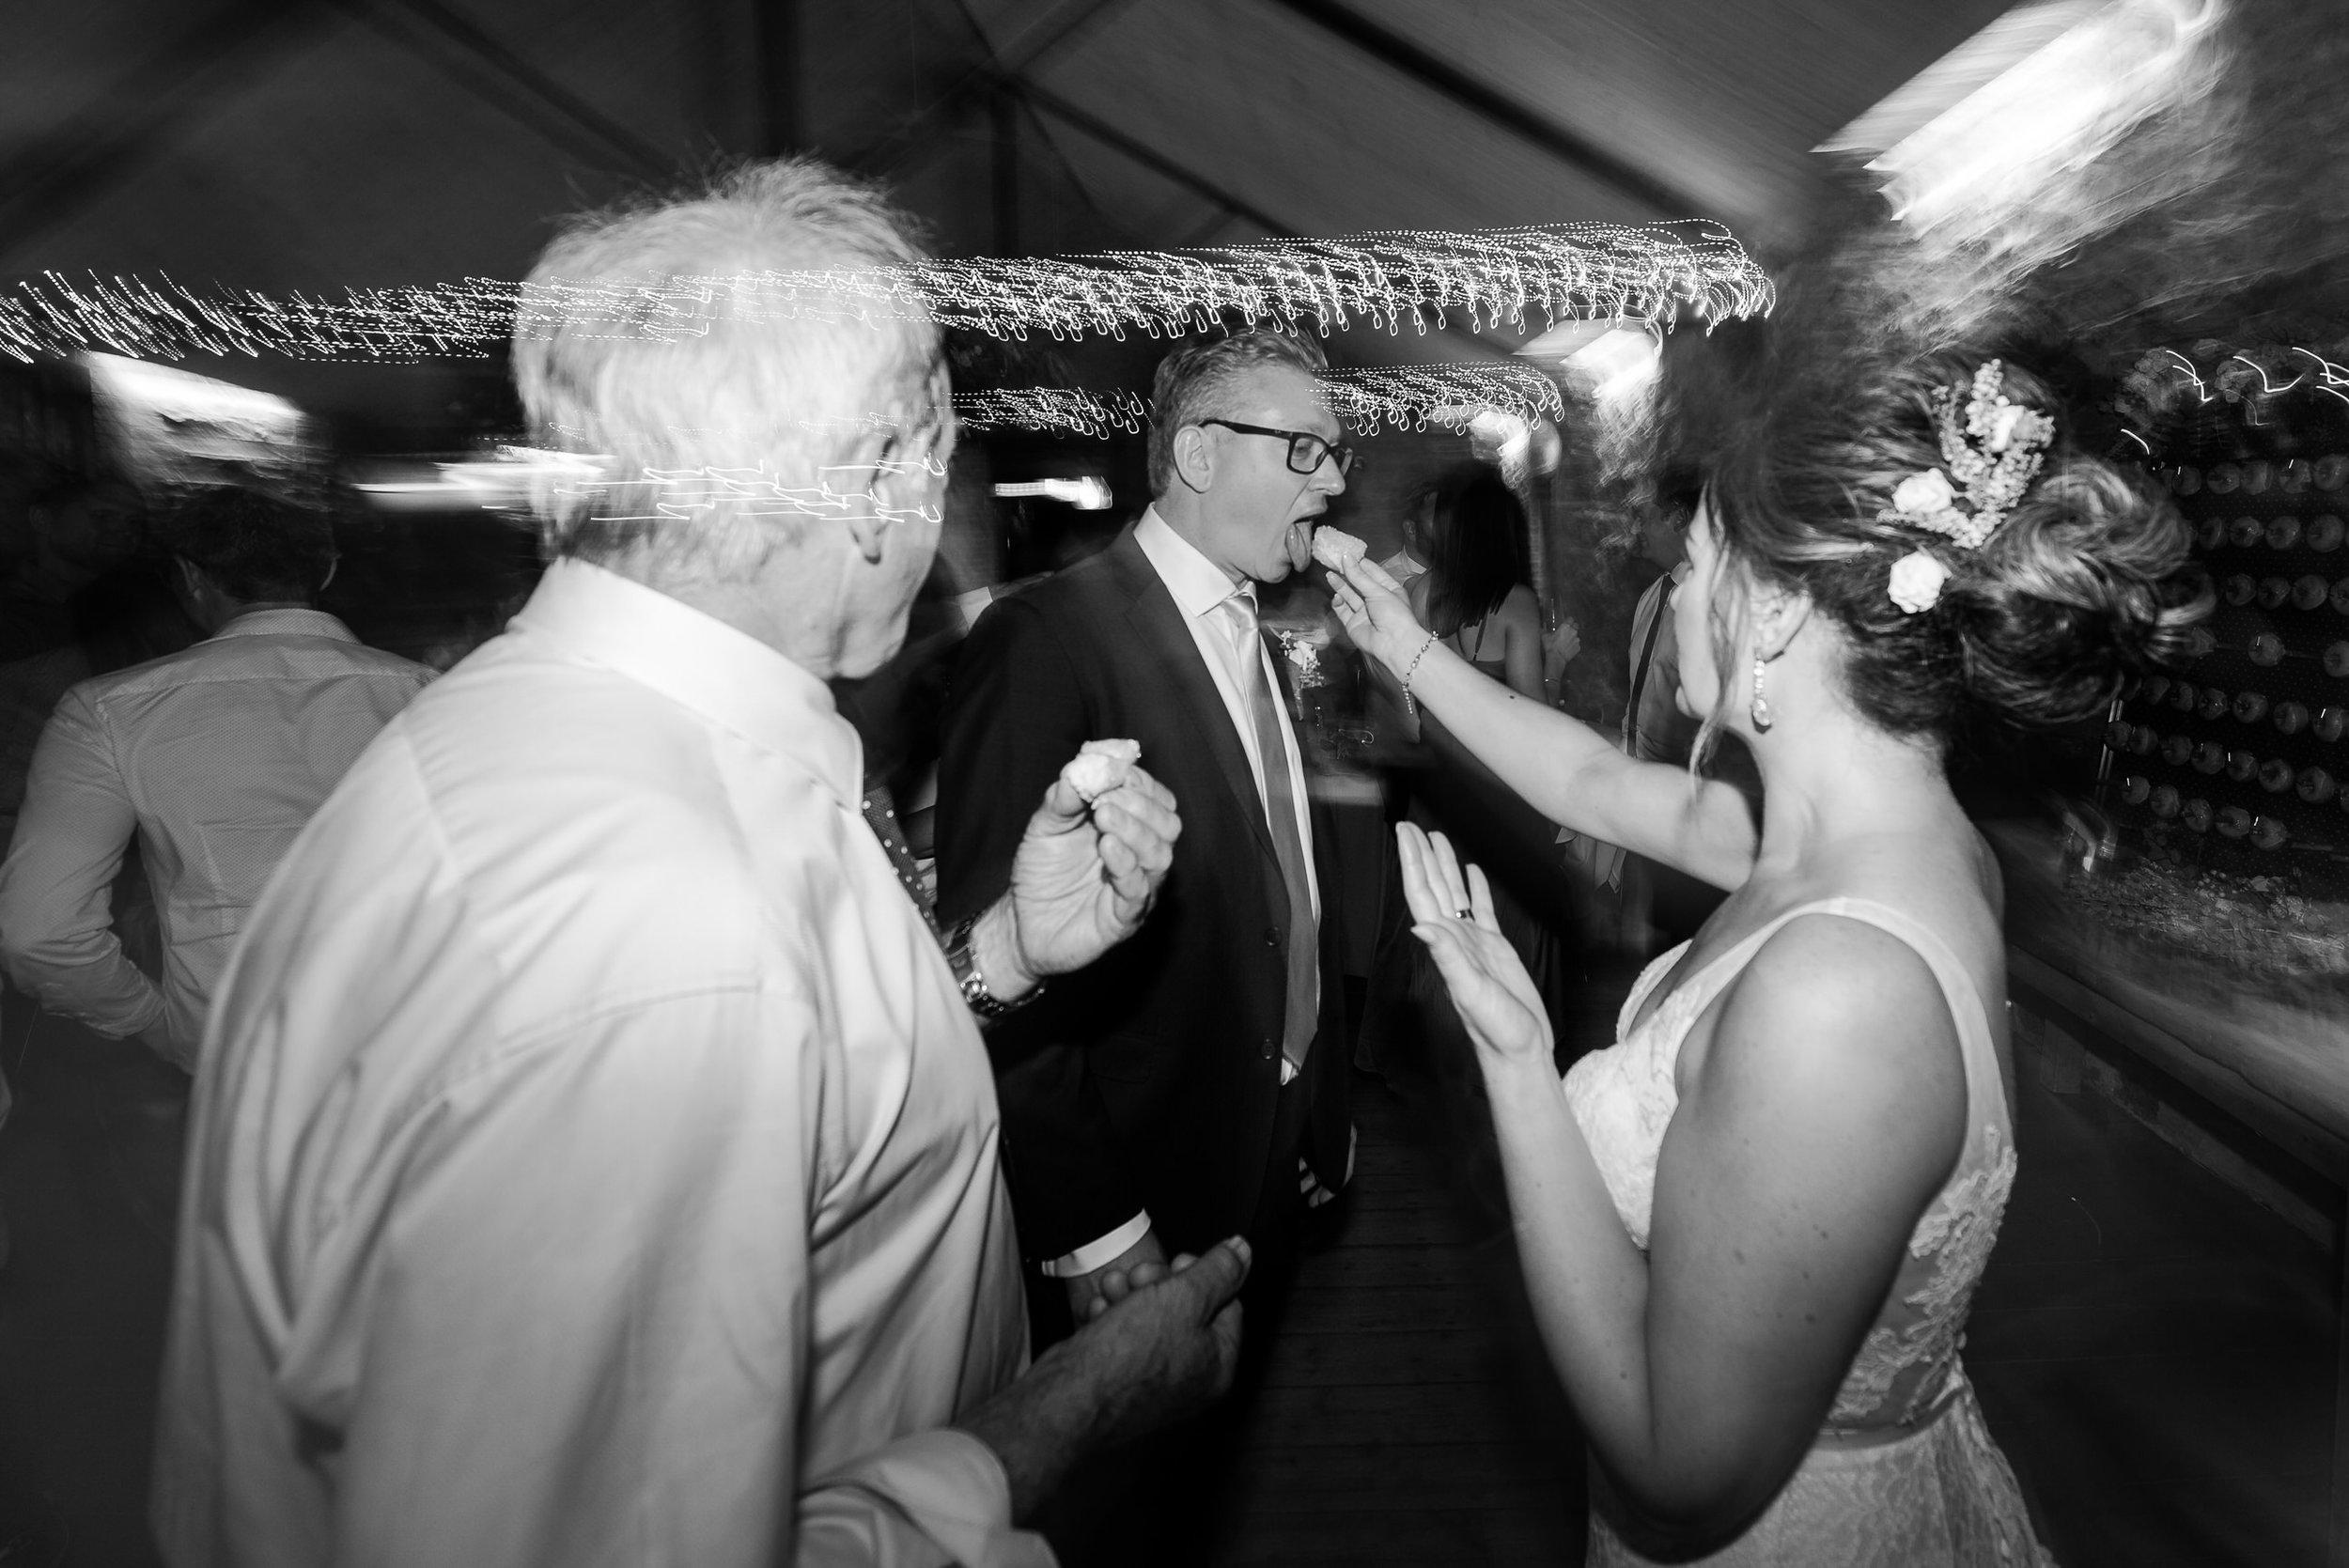 Justin_And_Jim_Photography_Chateau_Dore_Bendigo_Wedding99.JPG